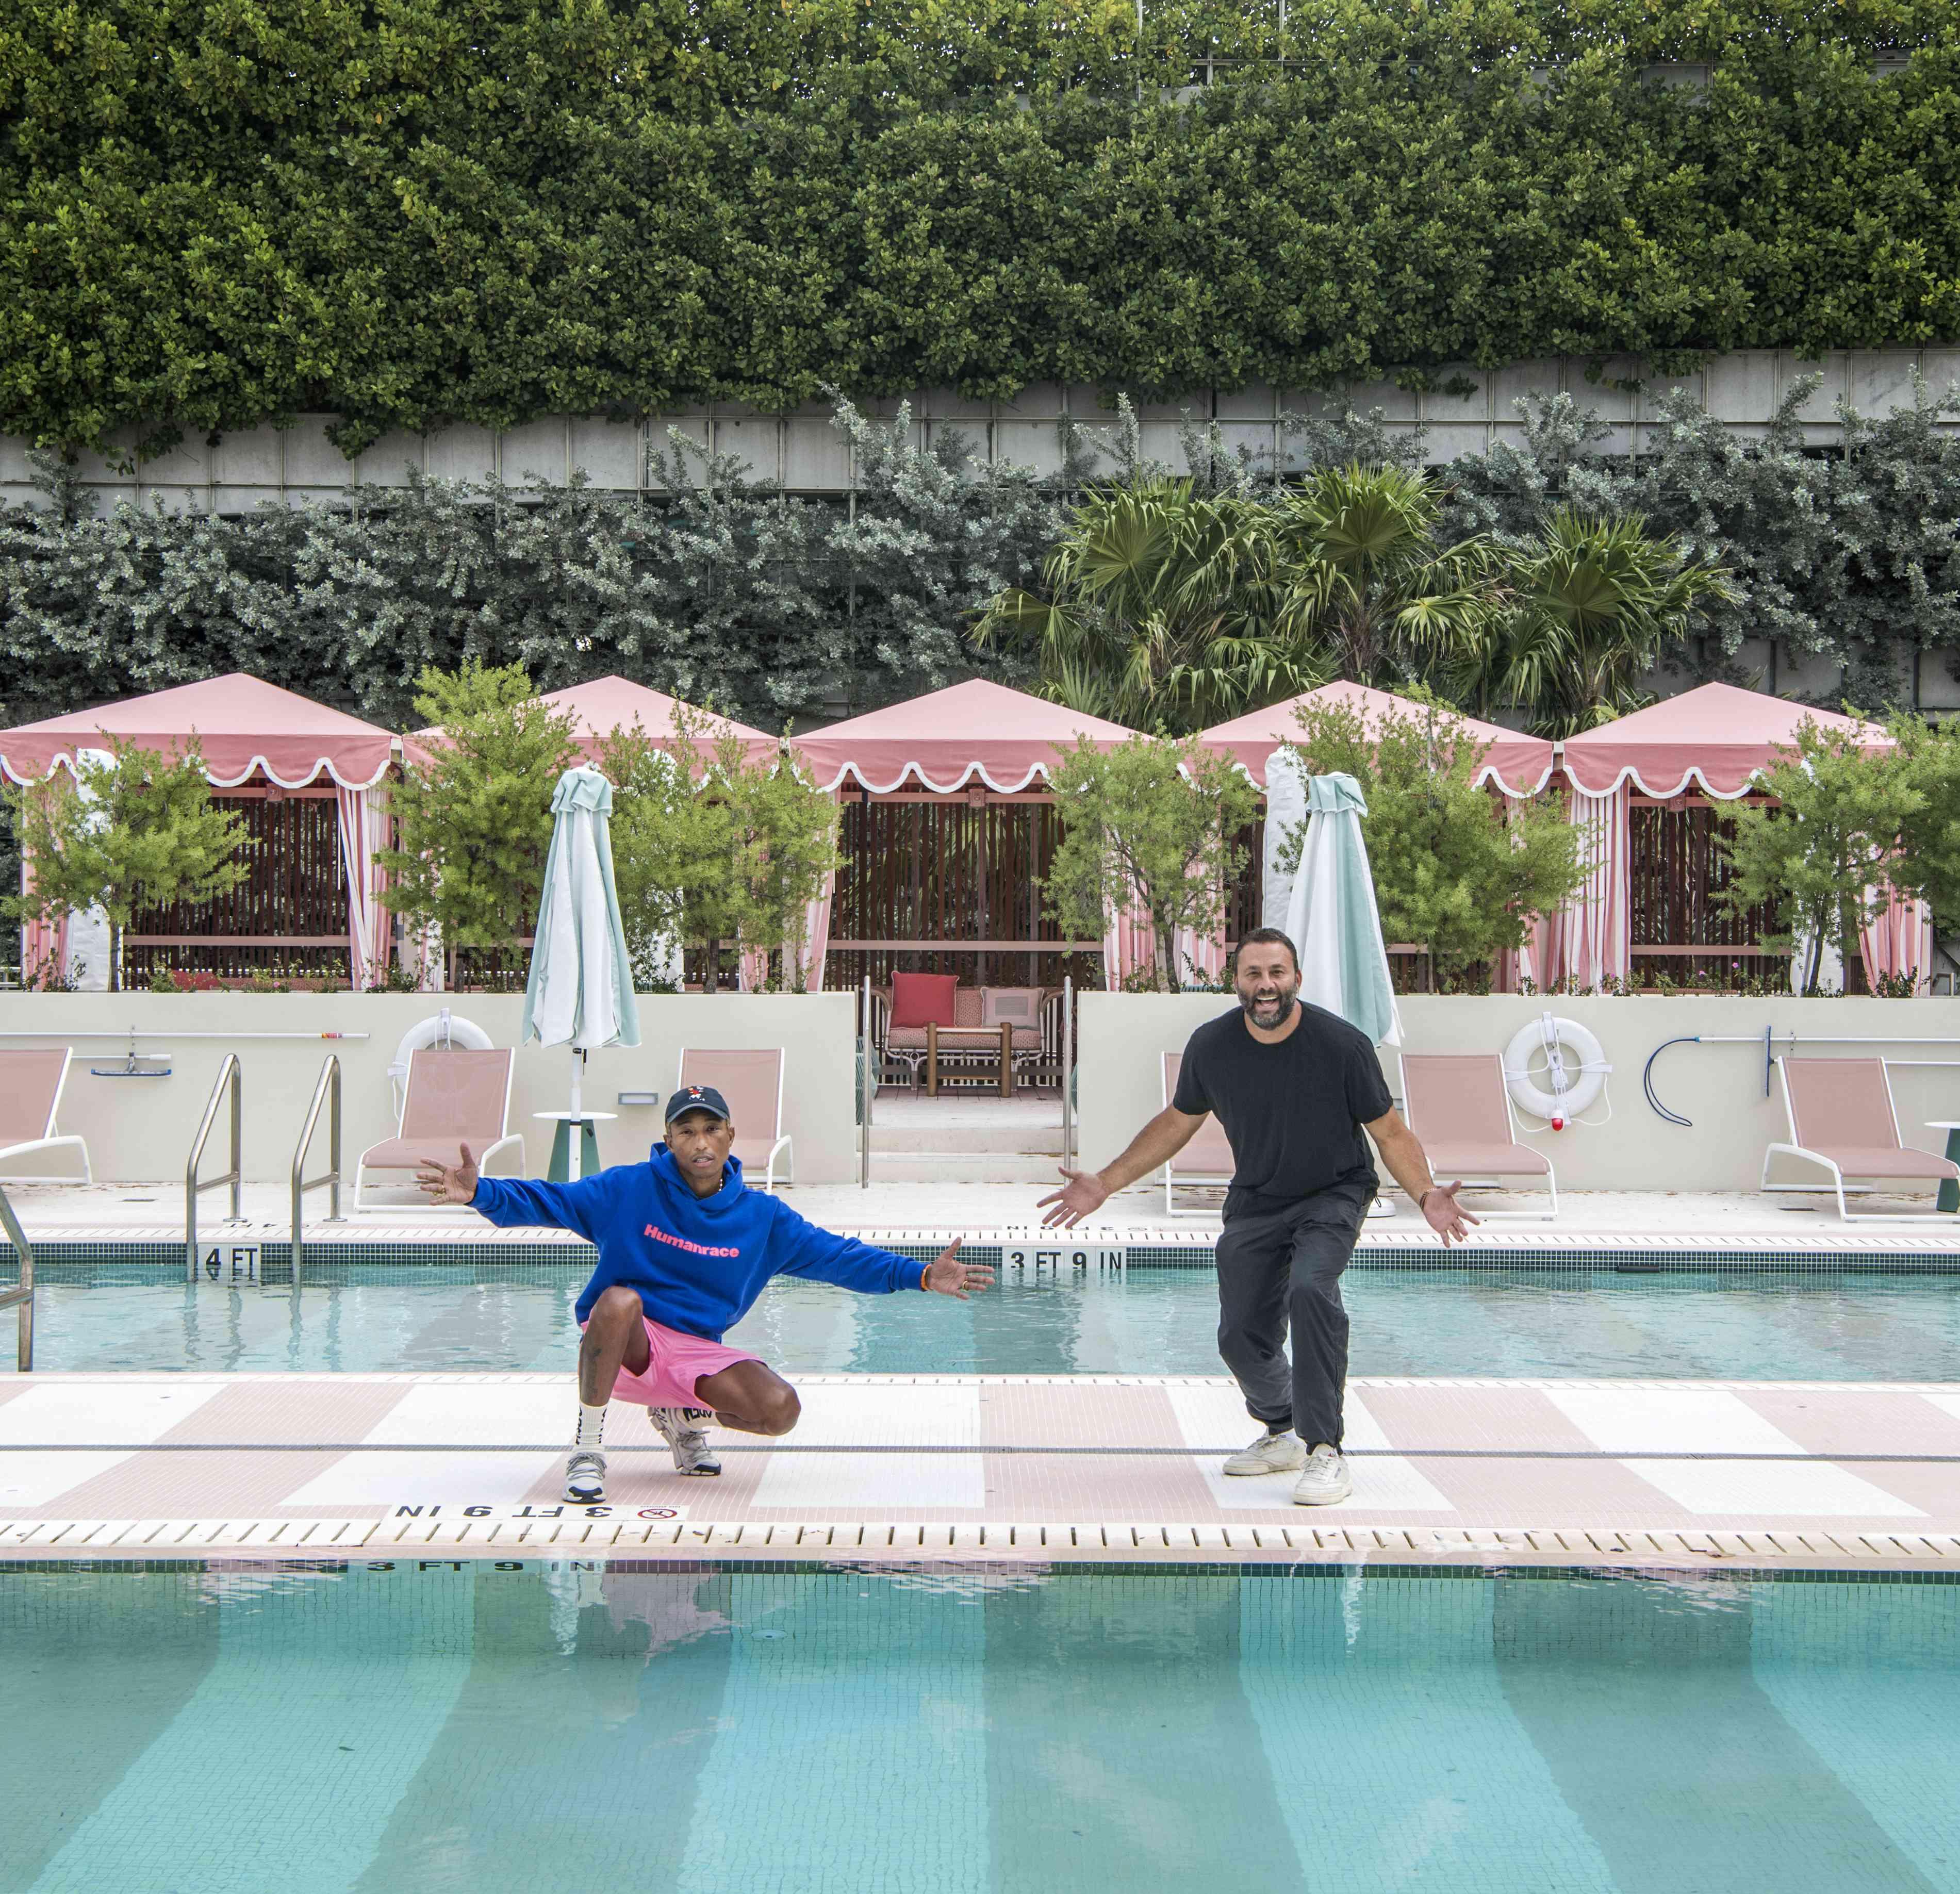 The Goodtime Hotel's Pharrell Williams and David Grutman